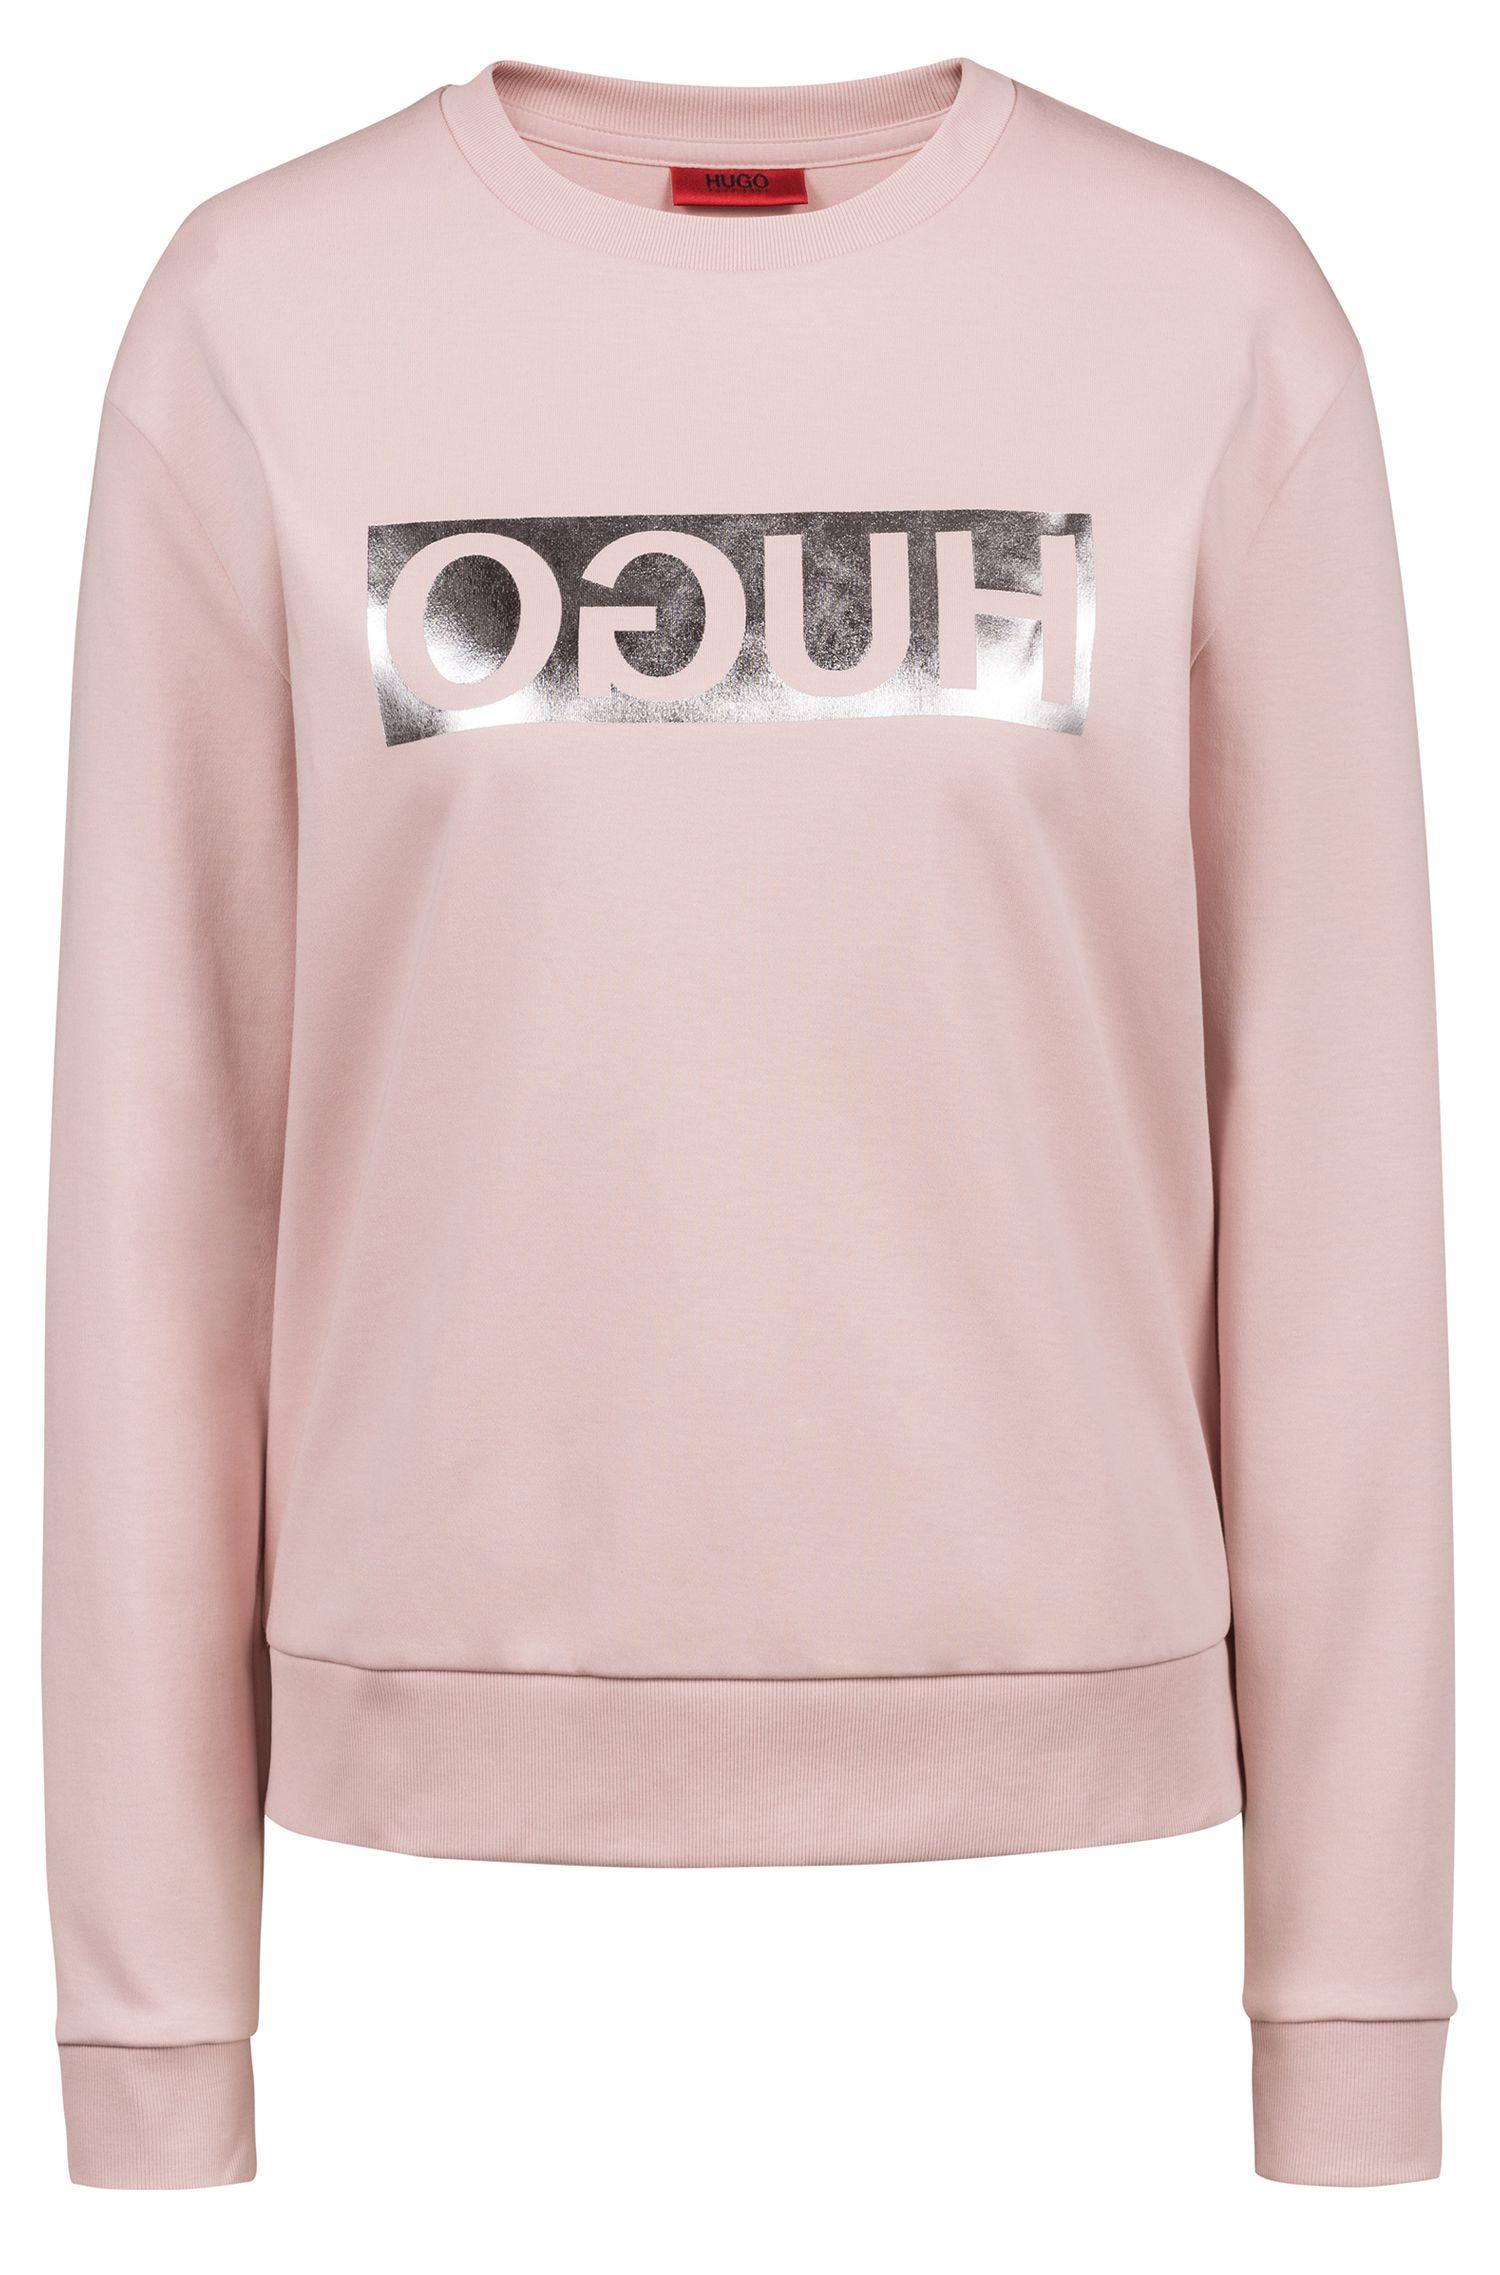 Long-sleeved cotton T-shirt with metallic reversed logo, light pink